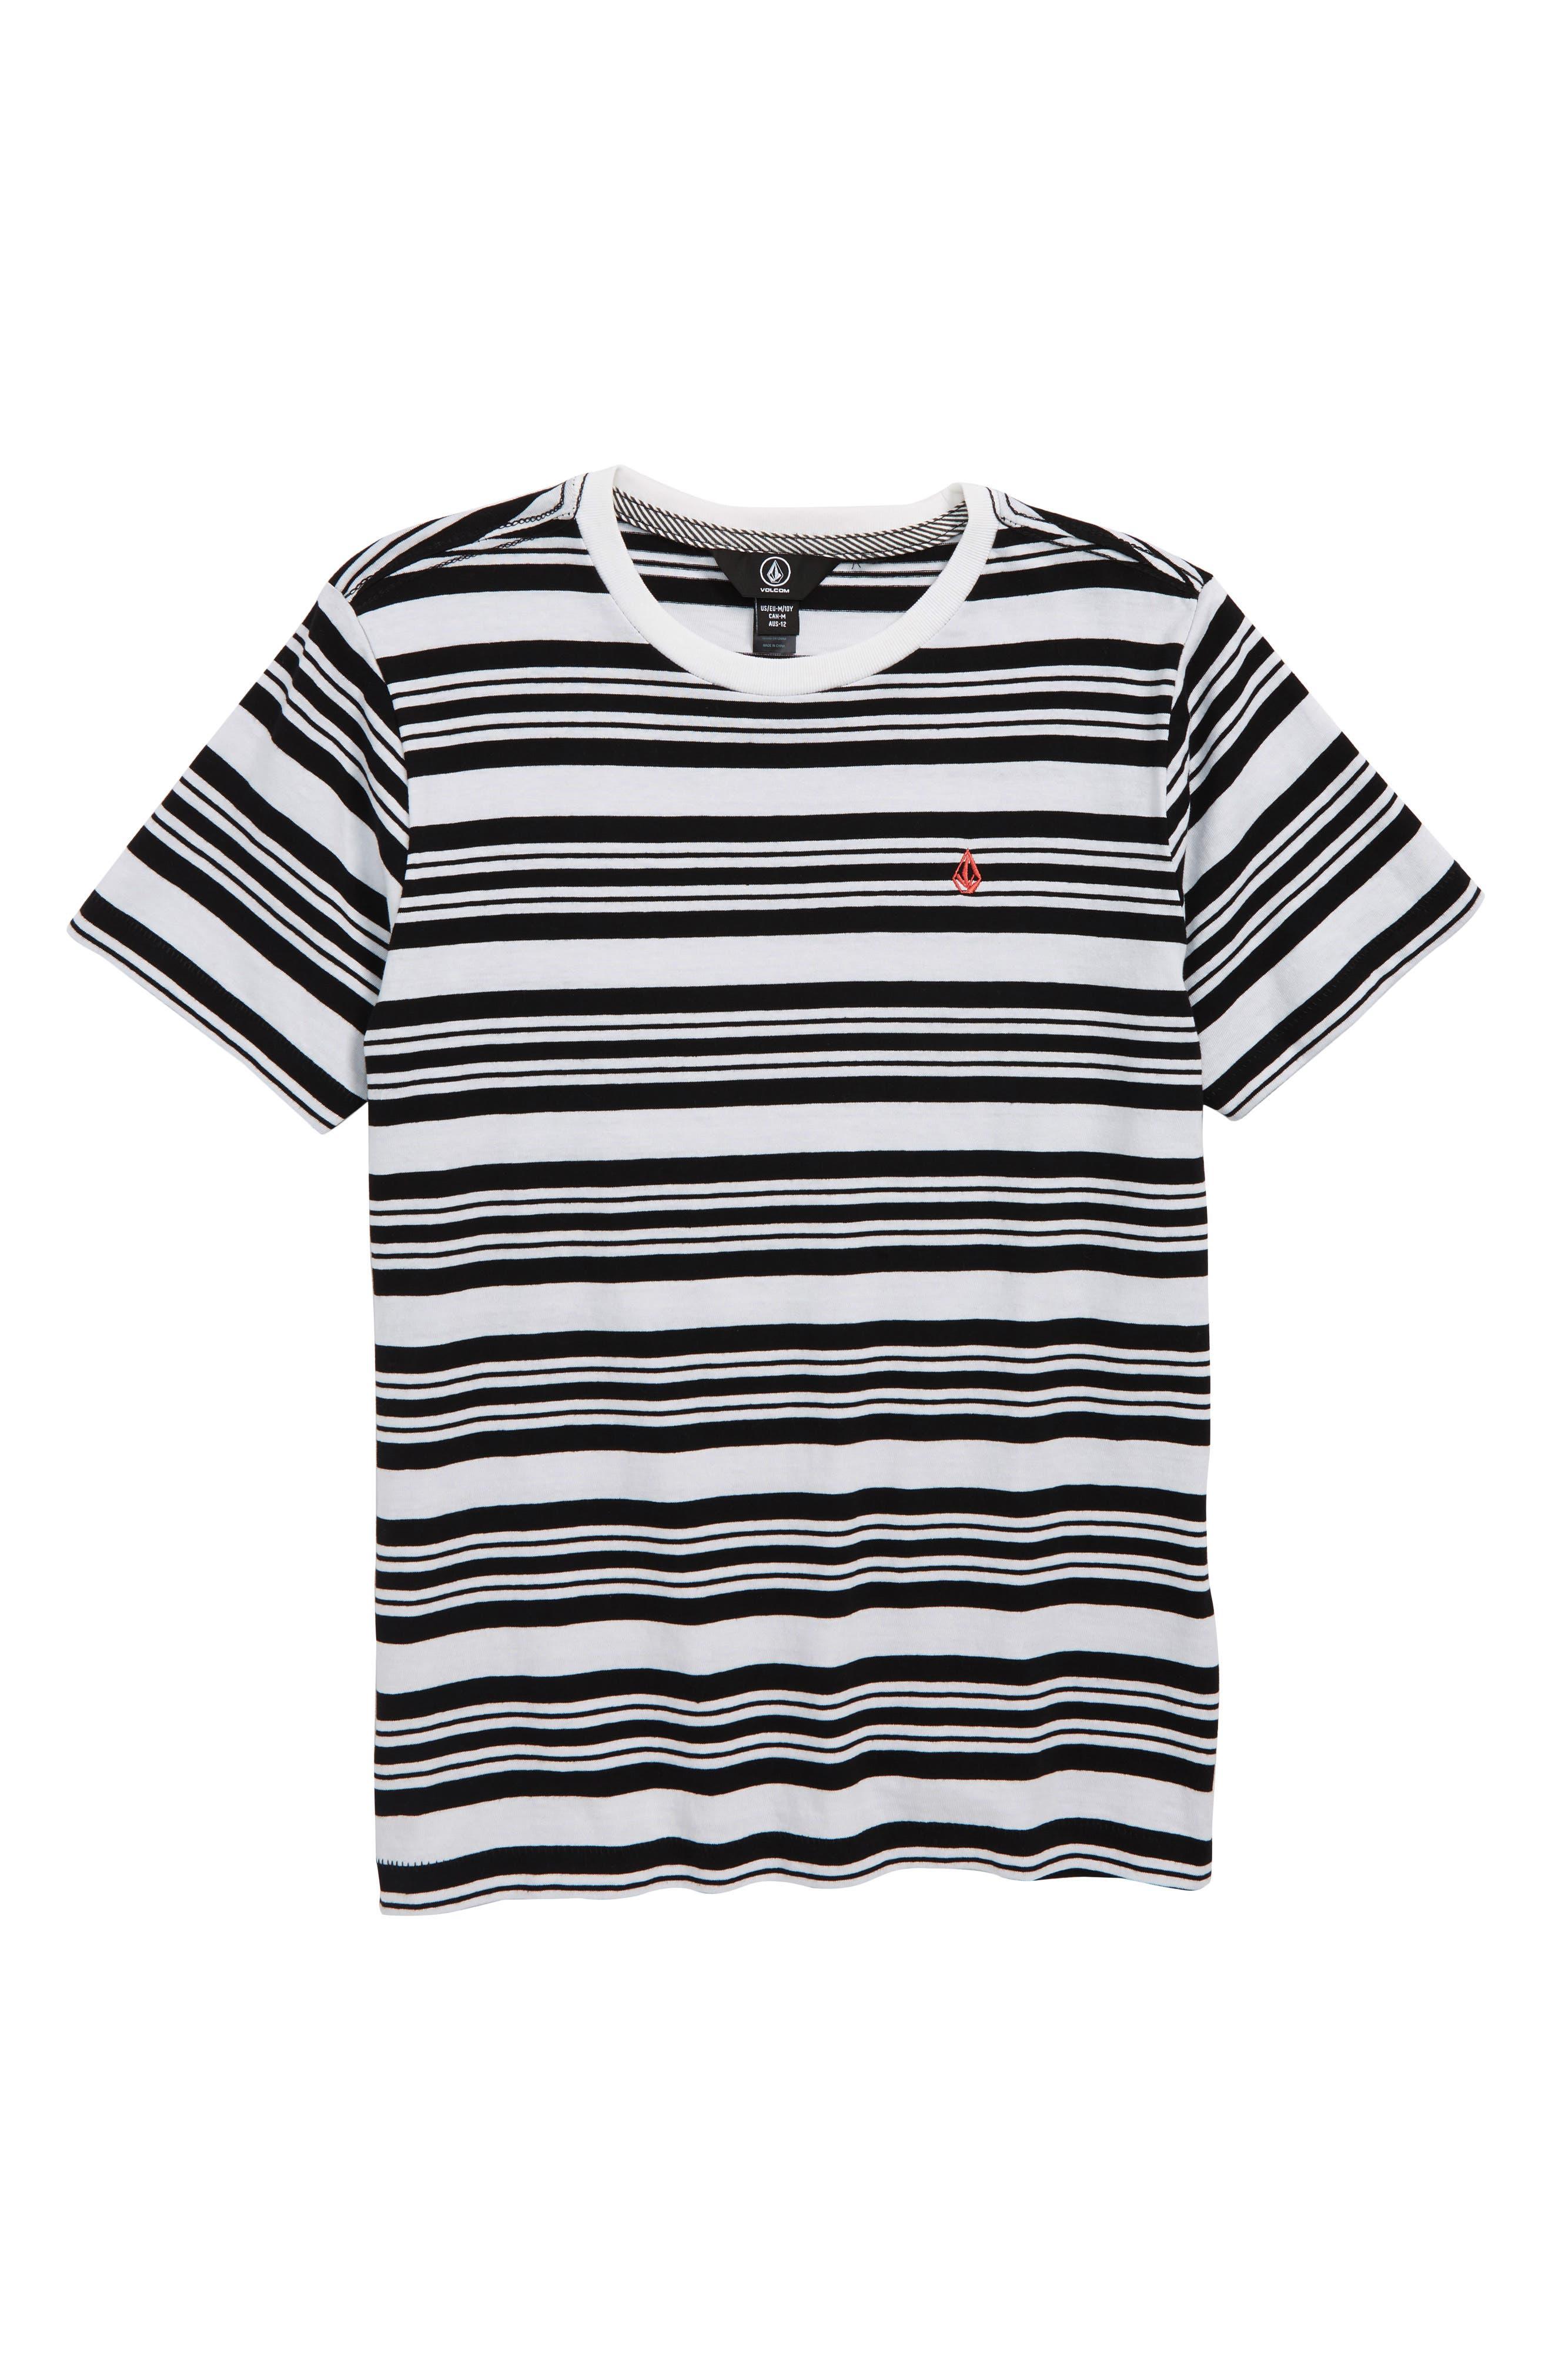 Randall T-Shirt,                         Main,                         color, WHITE